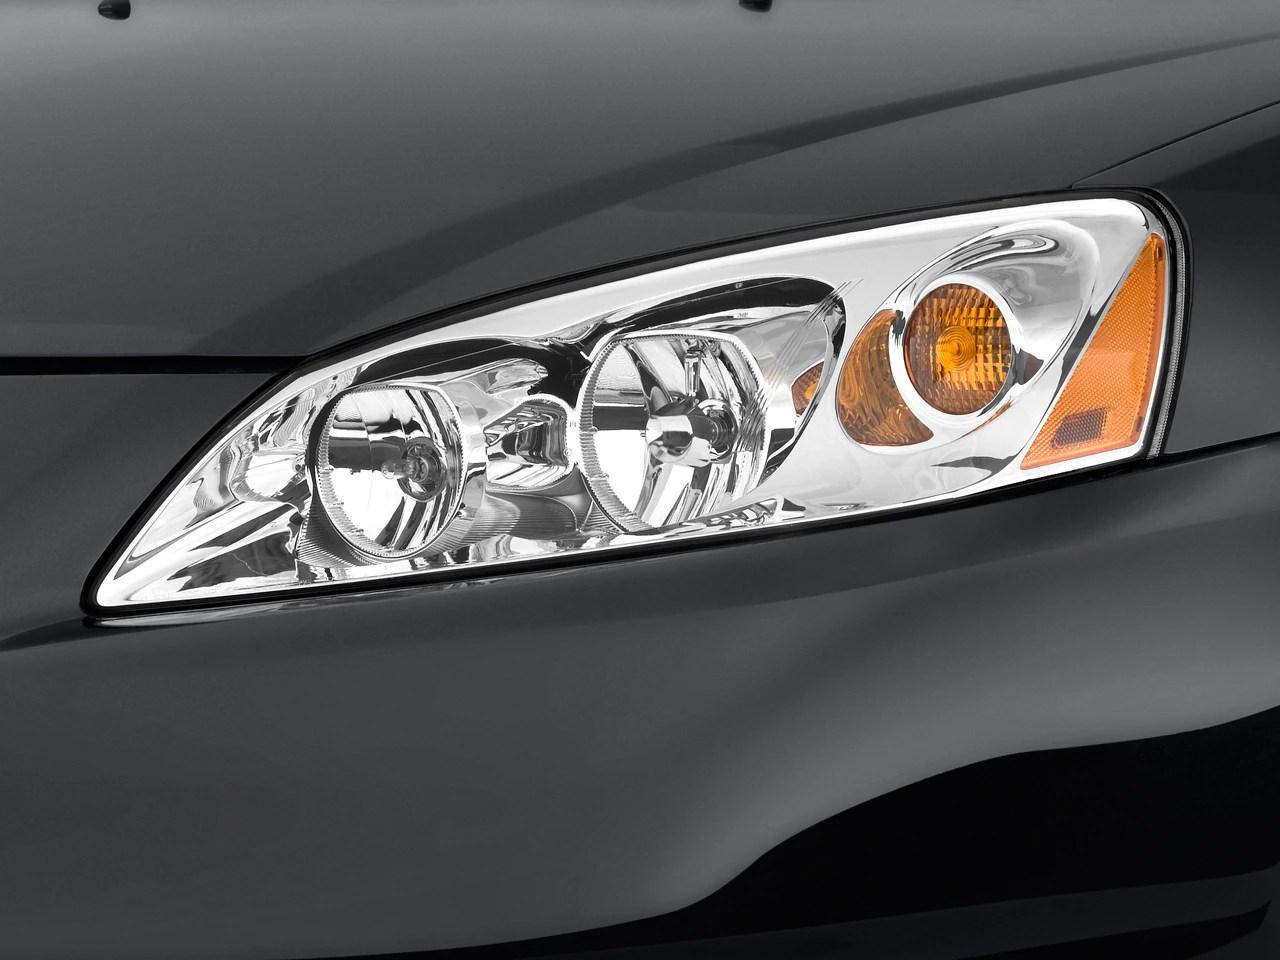 2009 pontiac g6 headlight wiring diagram delco alt 2005 headlights